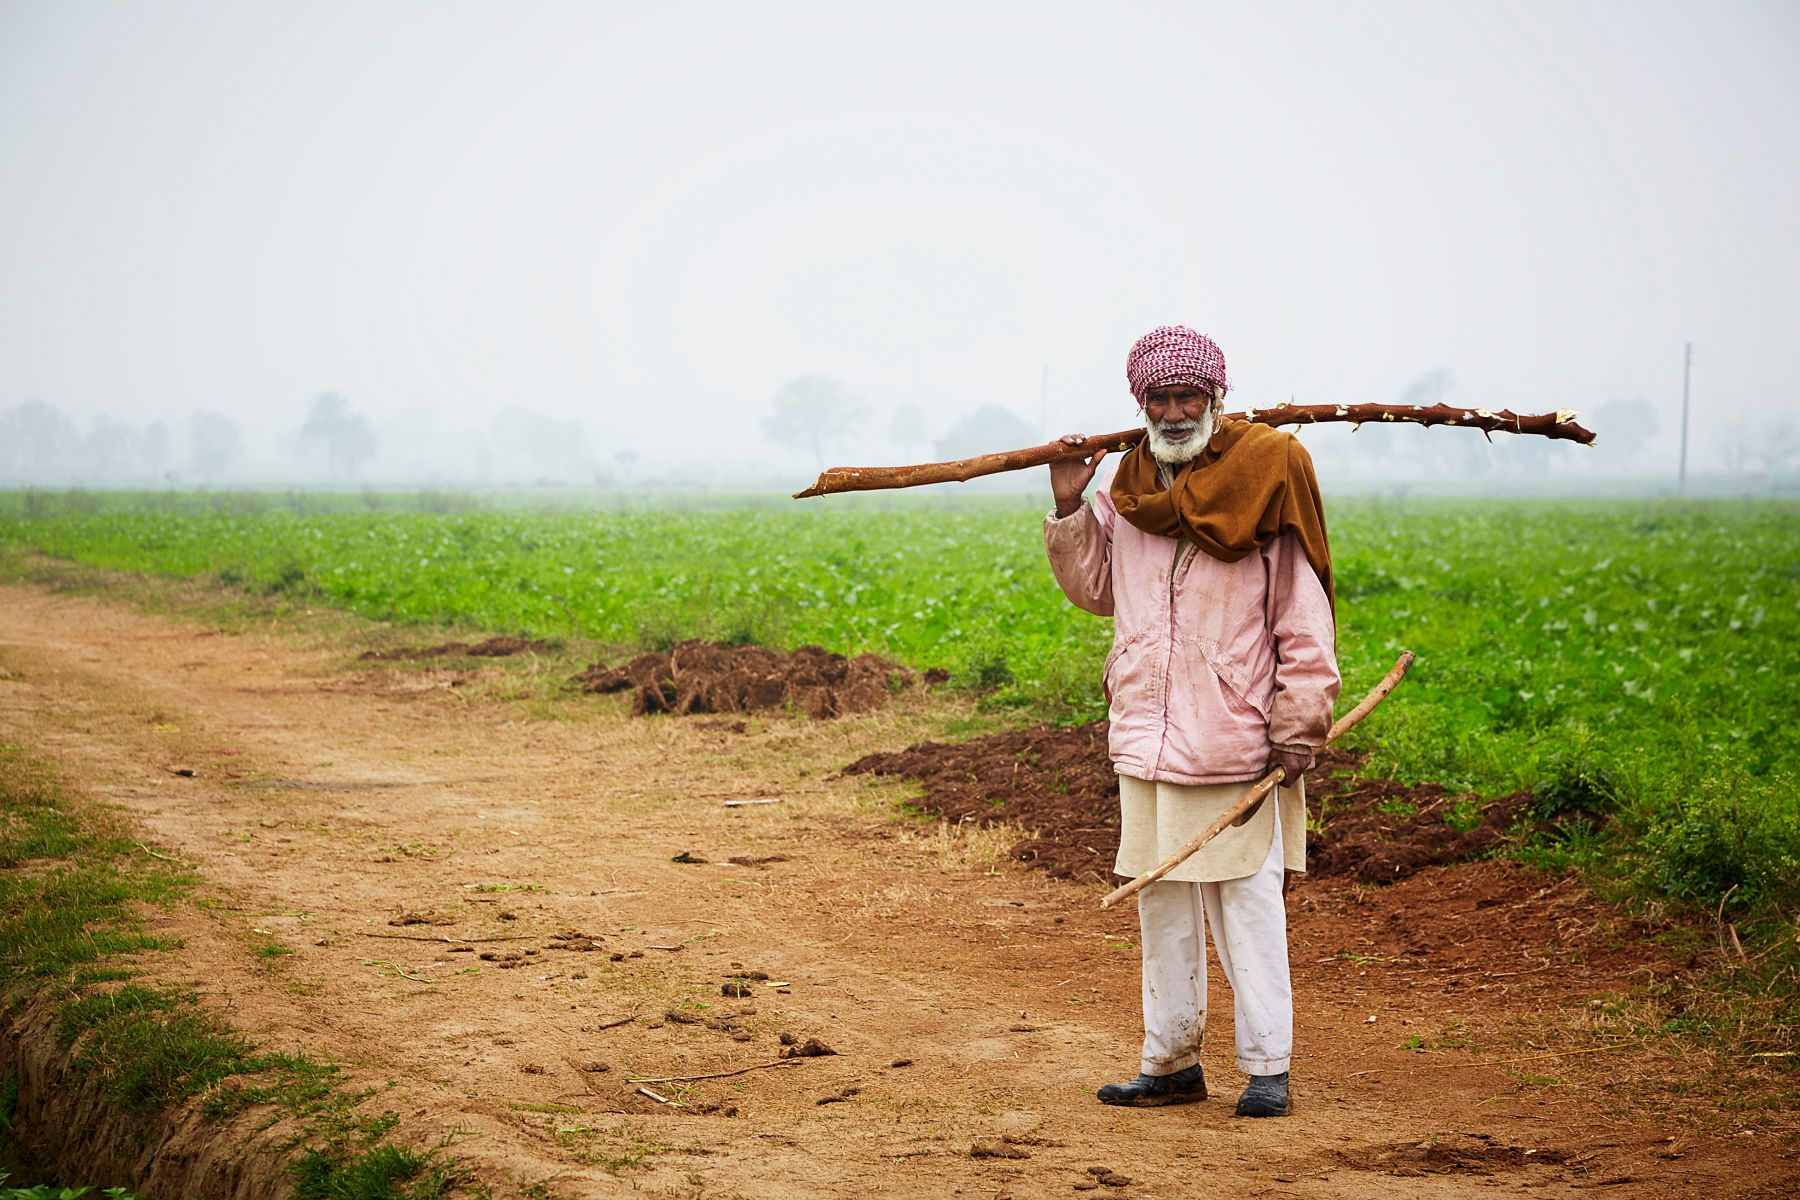 1r21_2015_01_india_jalalpur_0162.jpg